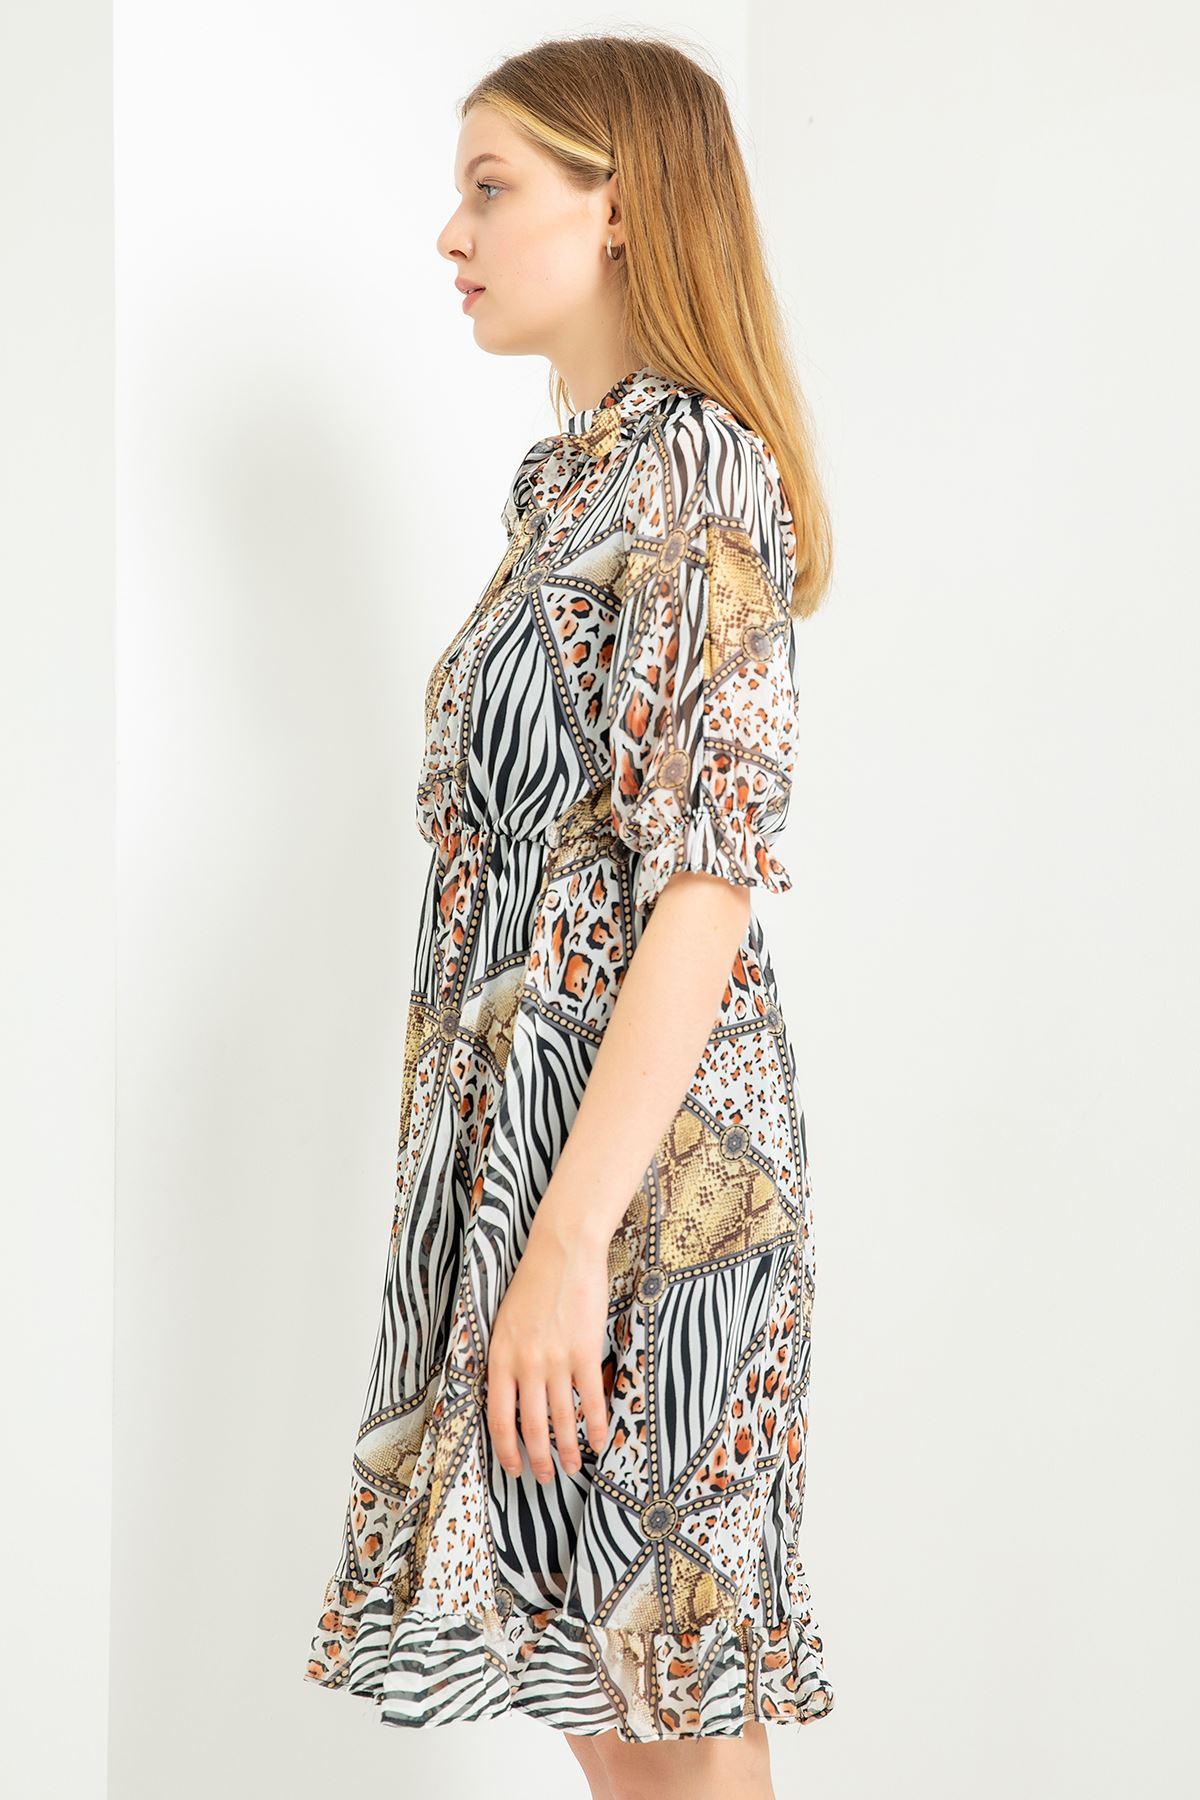 Pach Desen Kısa Kol Şifon Elbise-Siyah